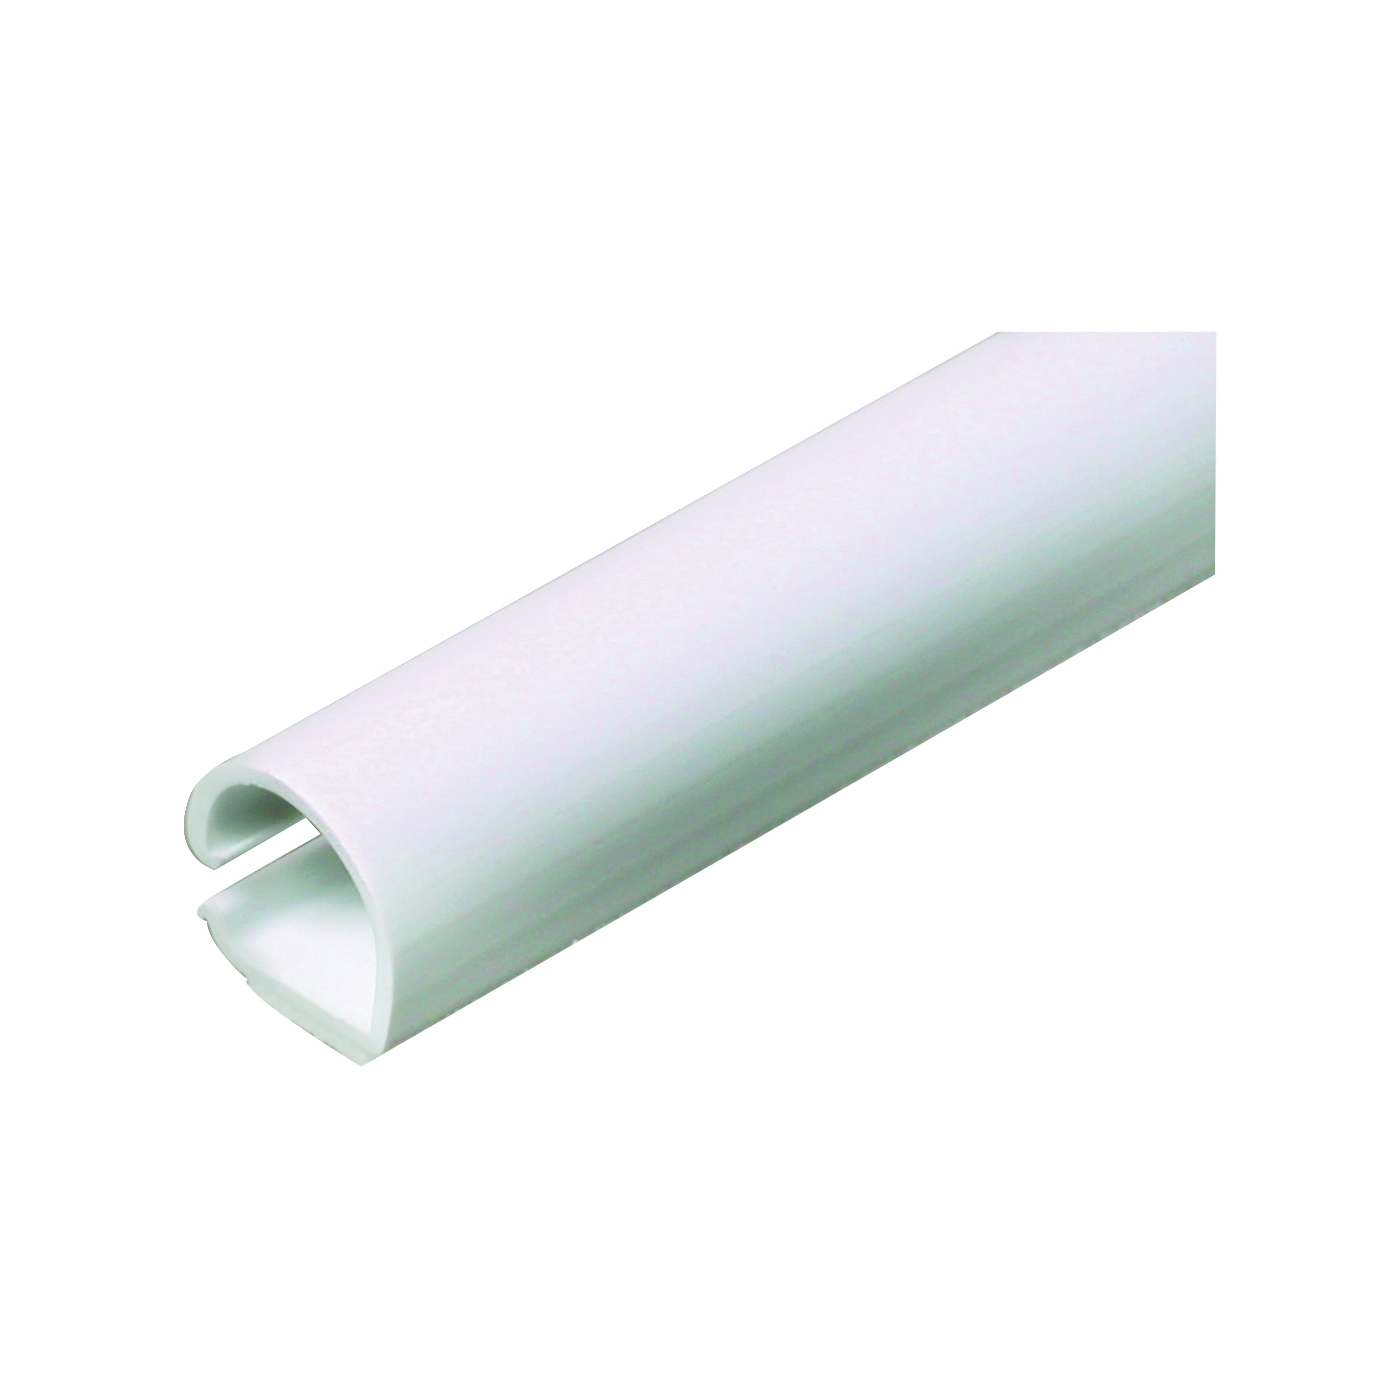 Picture of Legrand Wiremold CordMate C10 Cord Channel, 60 in L, 3/8 in W, 1-Channel, Plastic, White